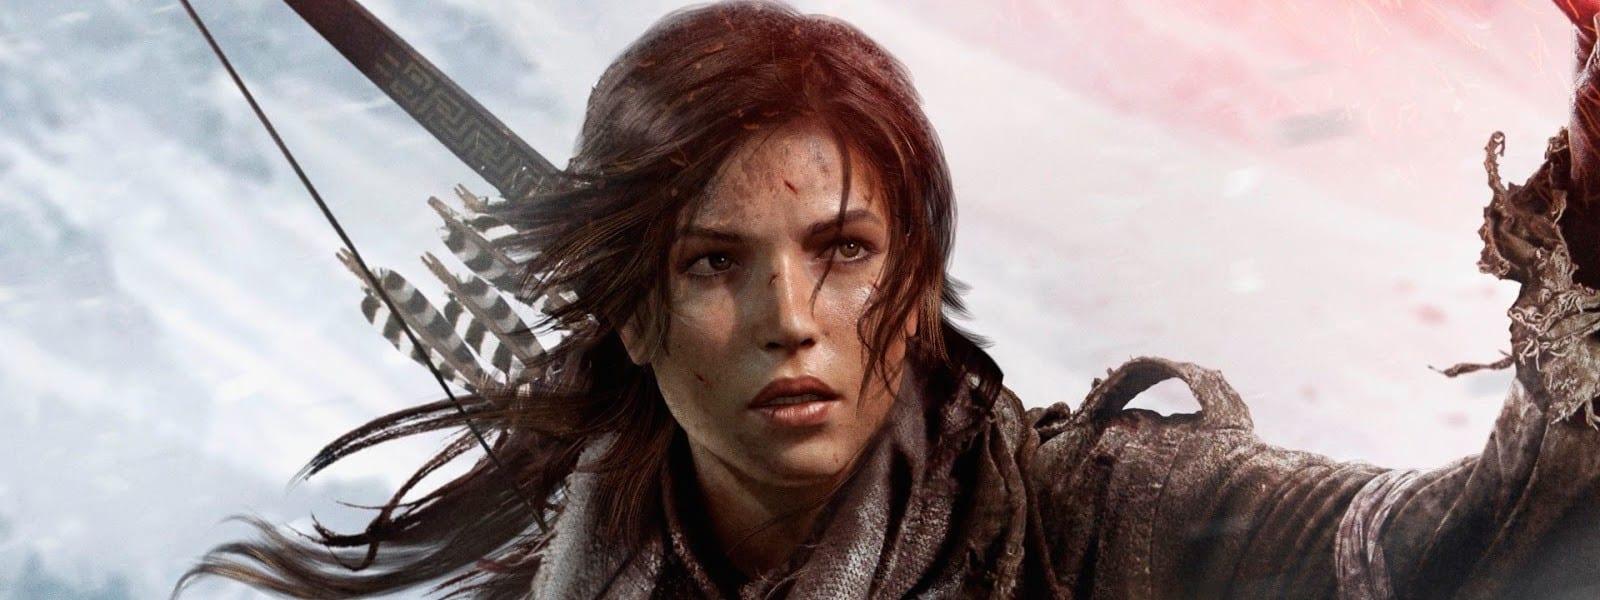 Battle Lara Croft VS Nathan Drake My Geek Actu Rise of The Tomb Raider